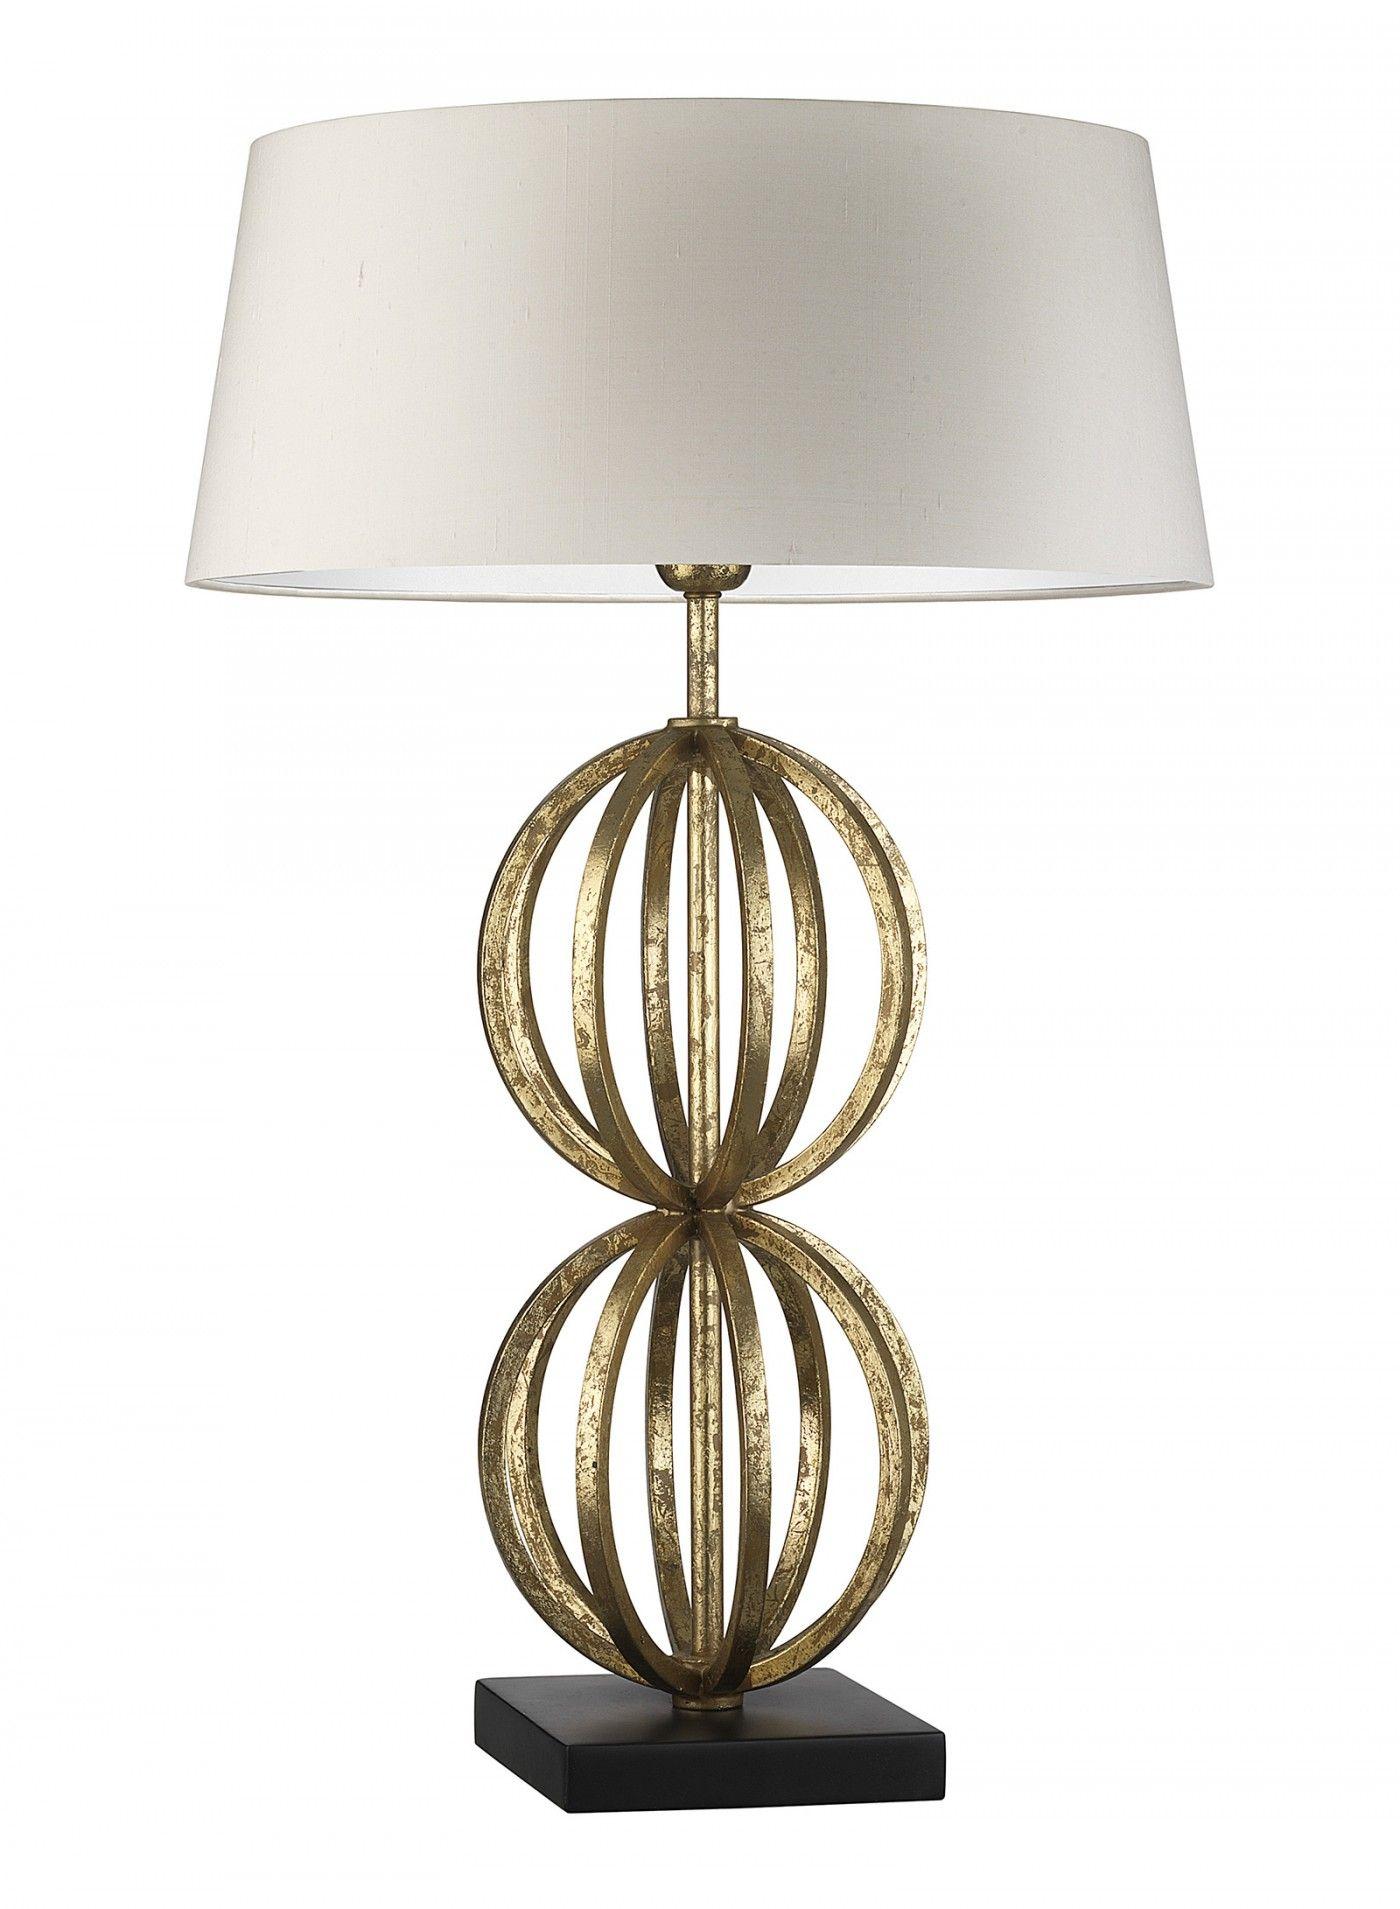 Rollo antique gold table lamp heathfield co light table rollo antique gold table lamp heathfield co geotapseo Gallery